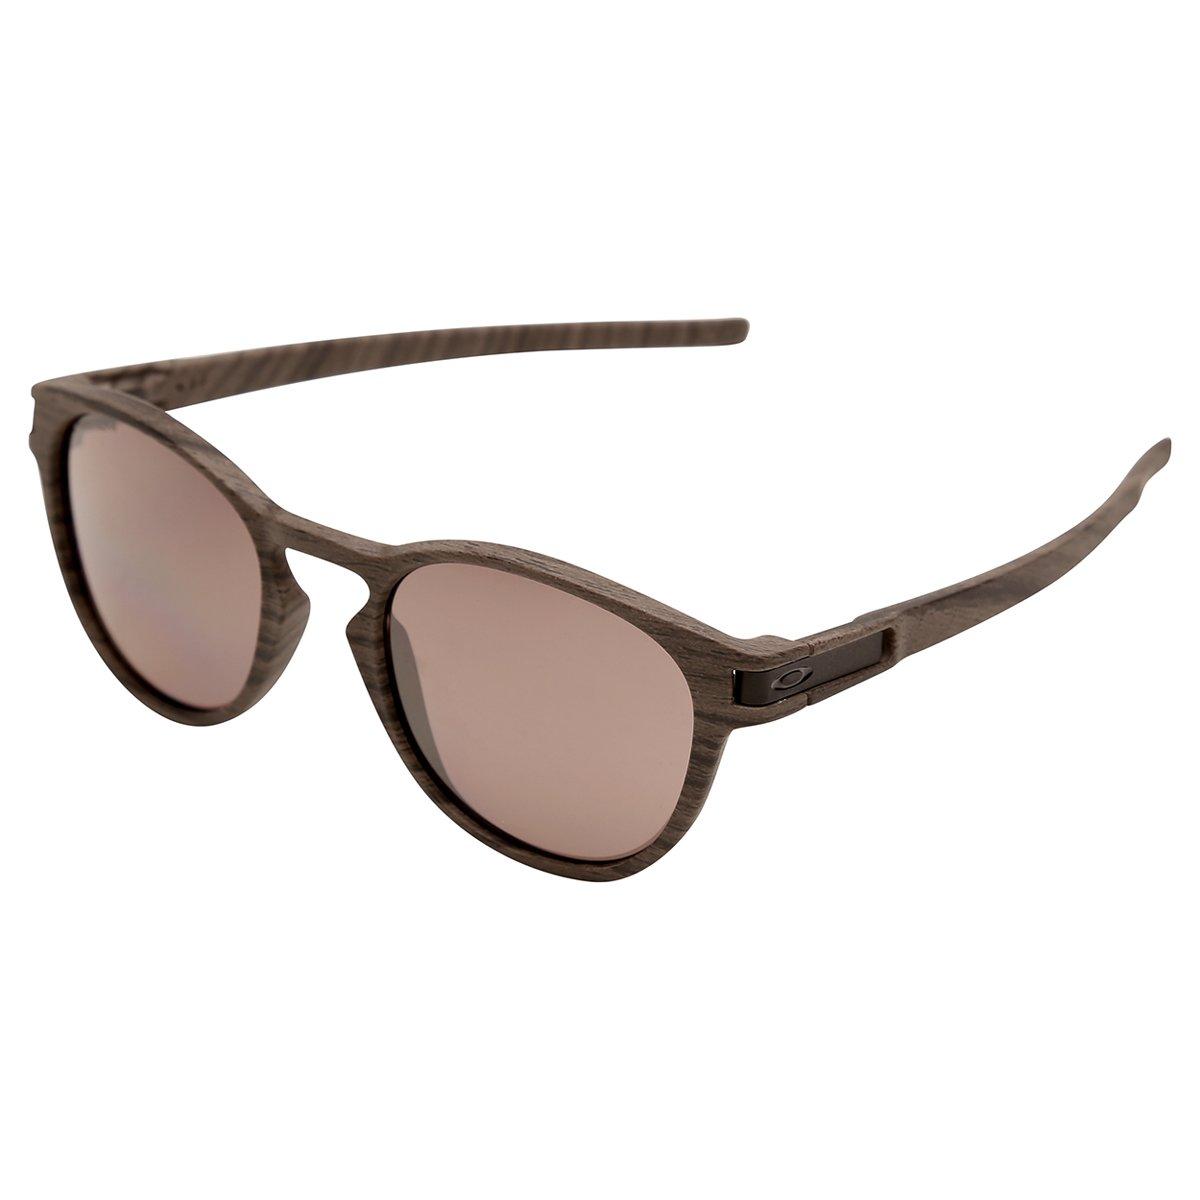 012ddb8429a5b Promoção em Óculos de Sol Oakley Latch Polarizado Masculino - Marrom ...